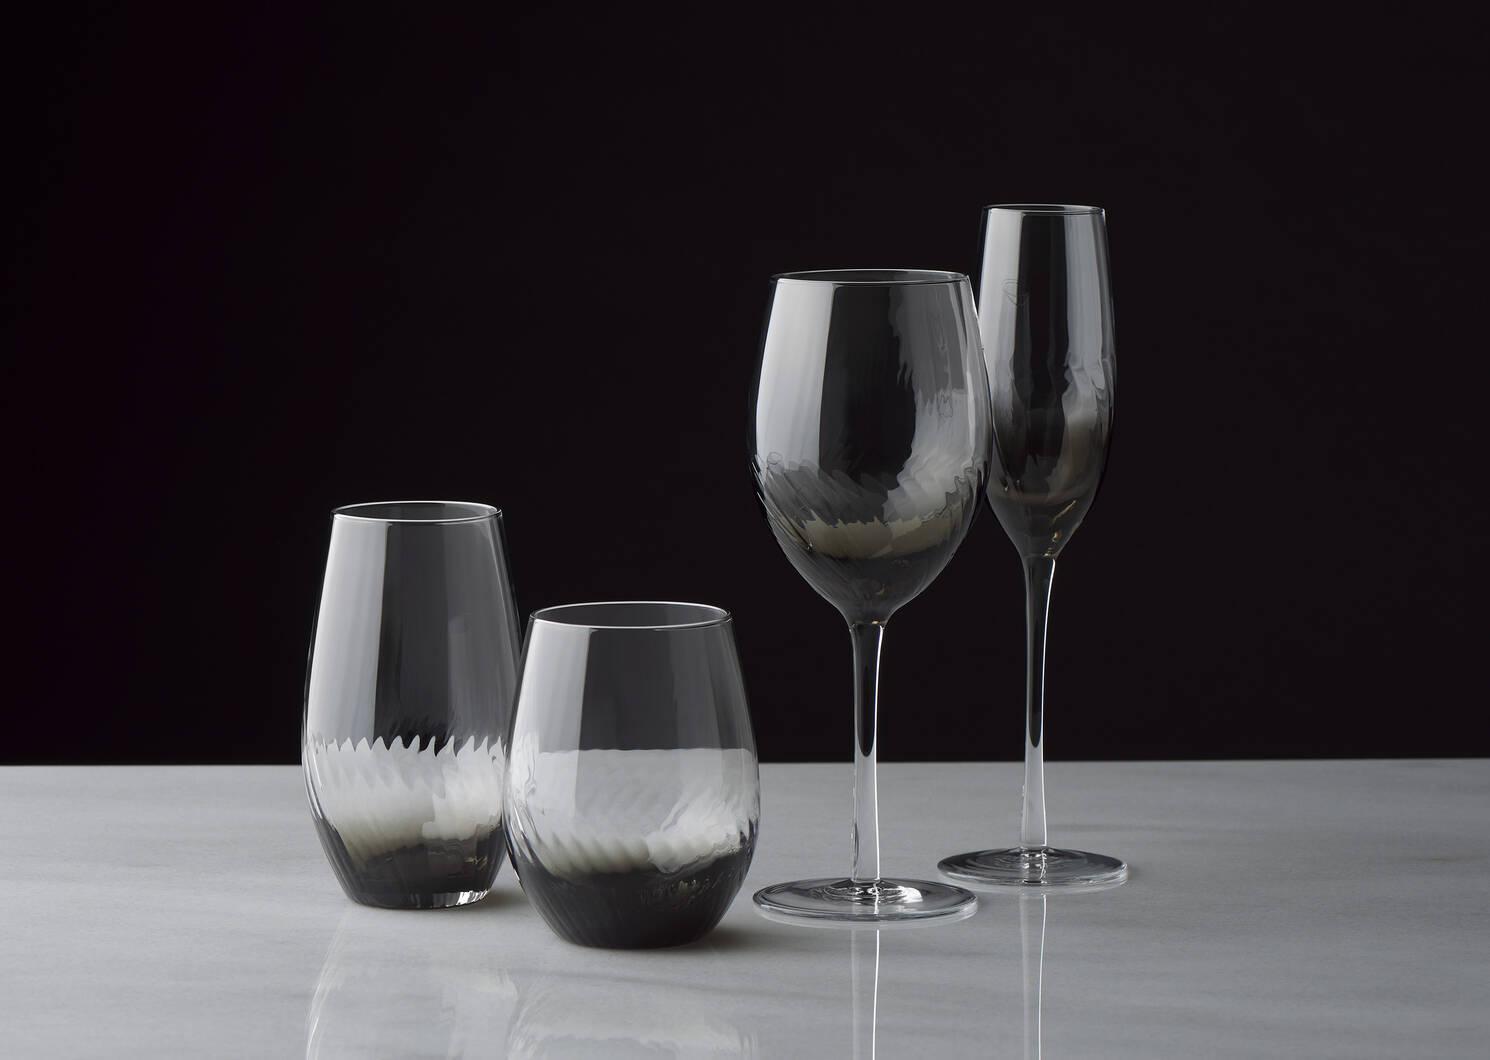 Revel Champagne Flute Grey